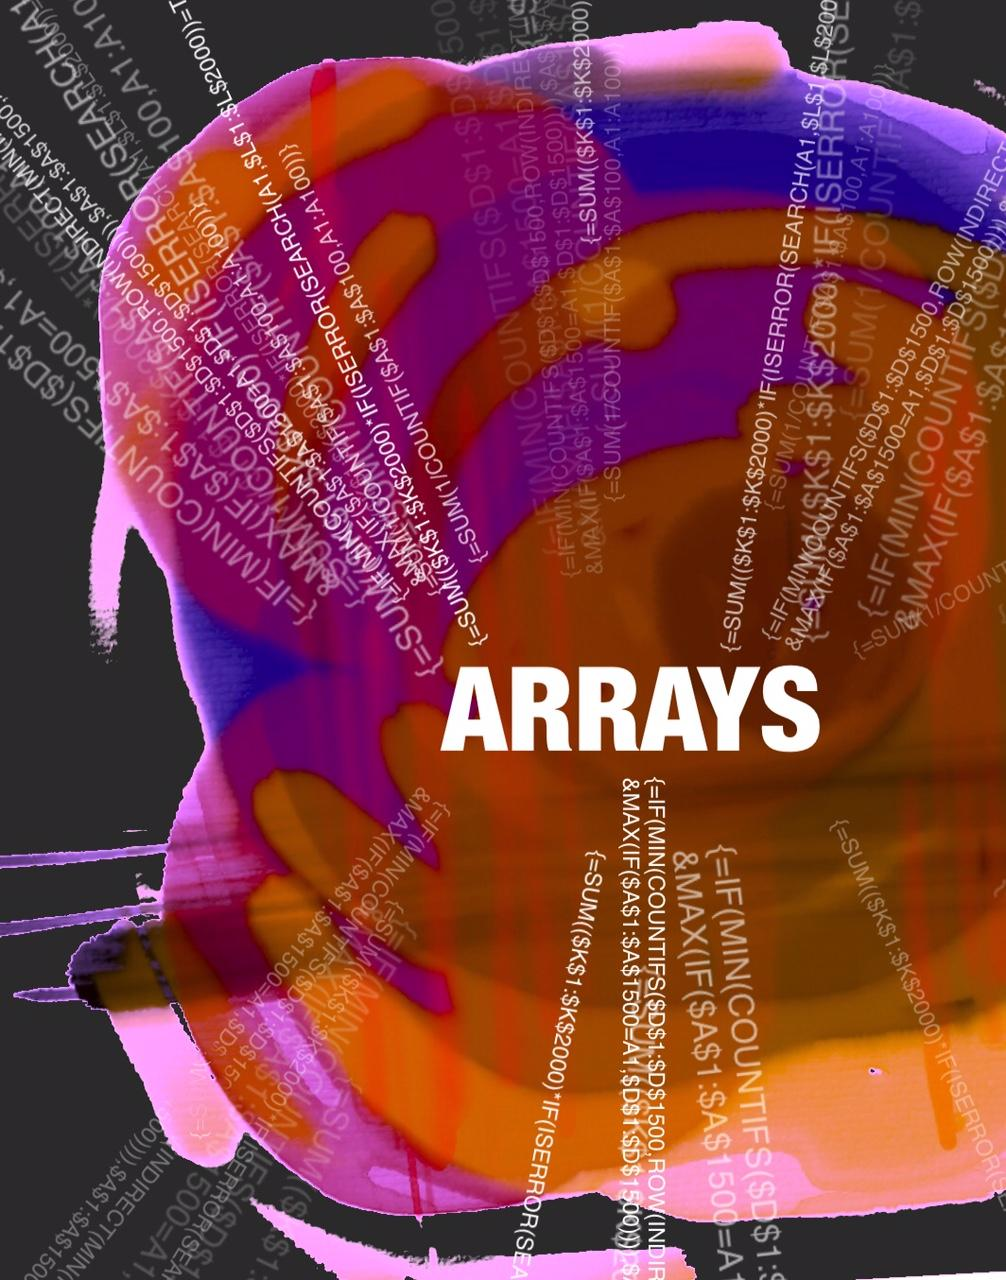 Array Formulas - A New Use